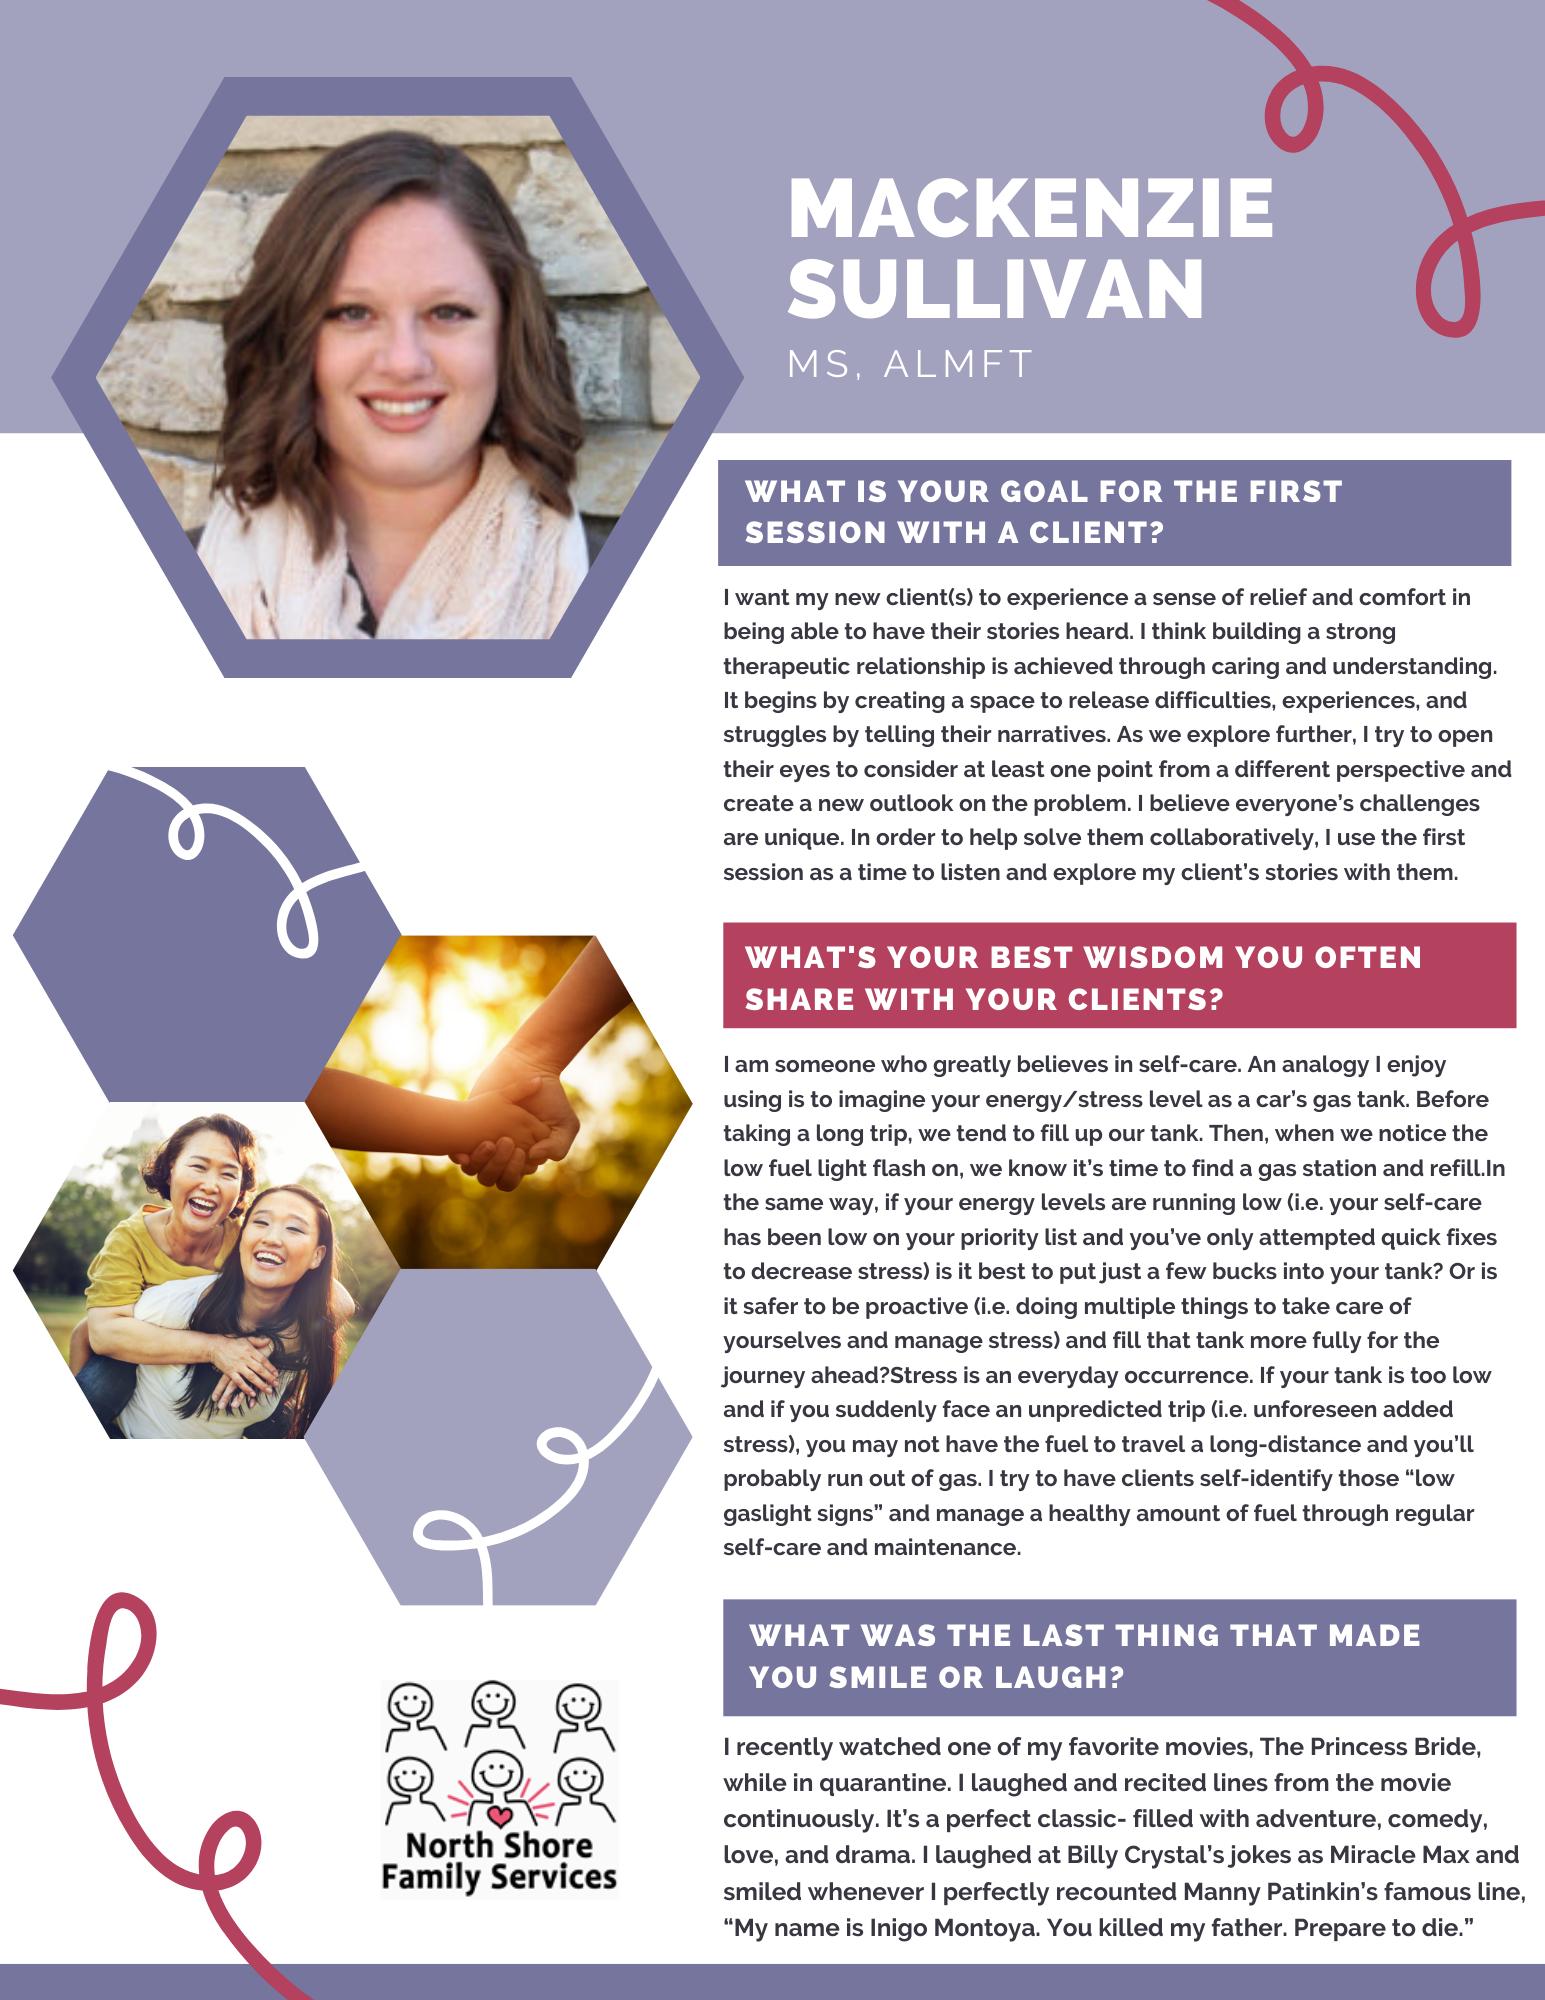 NSFS Therapist - Mackenzie Sullivan